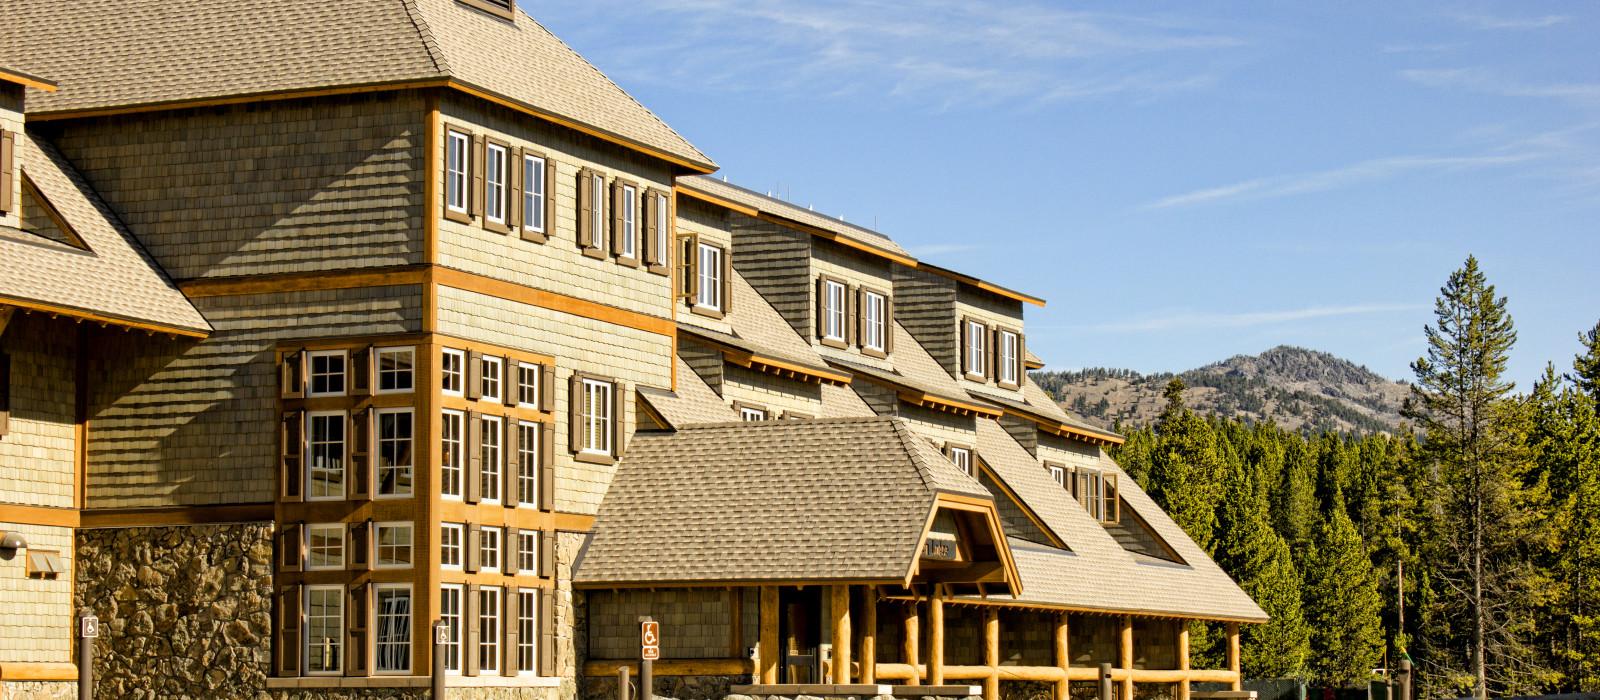 Hotel Canyon Lodge and Cabins USA